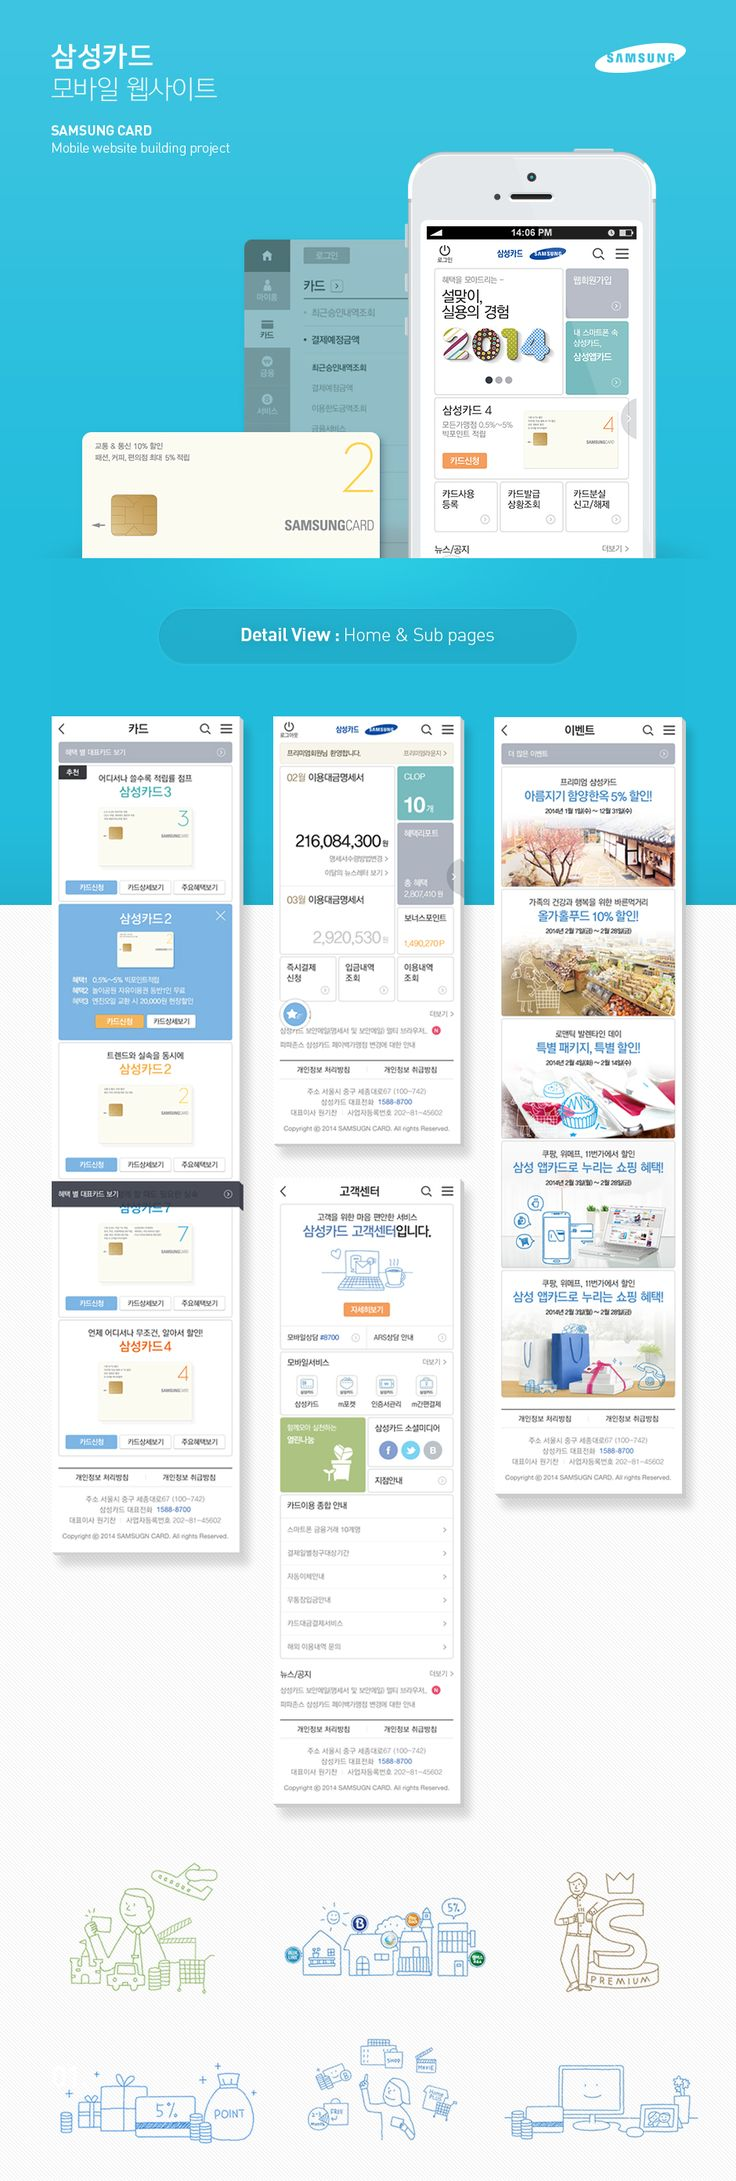 Samsungcard Mobiledetail image